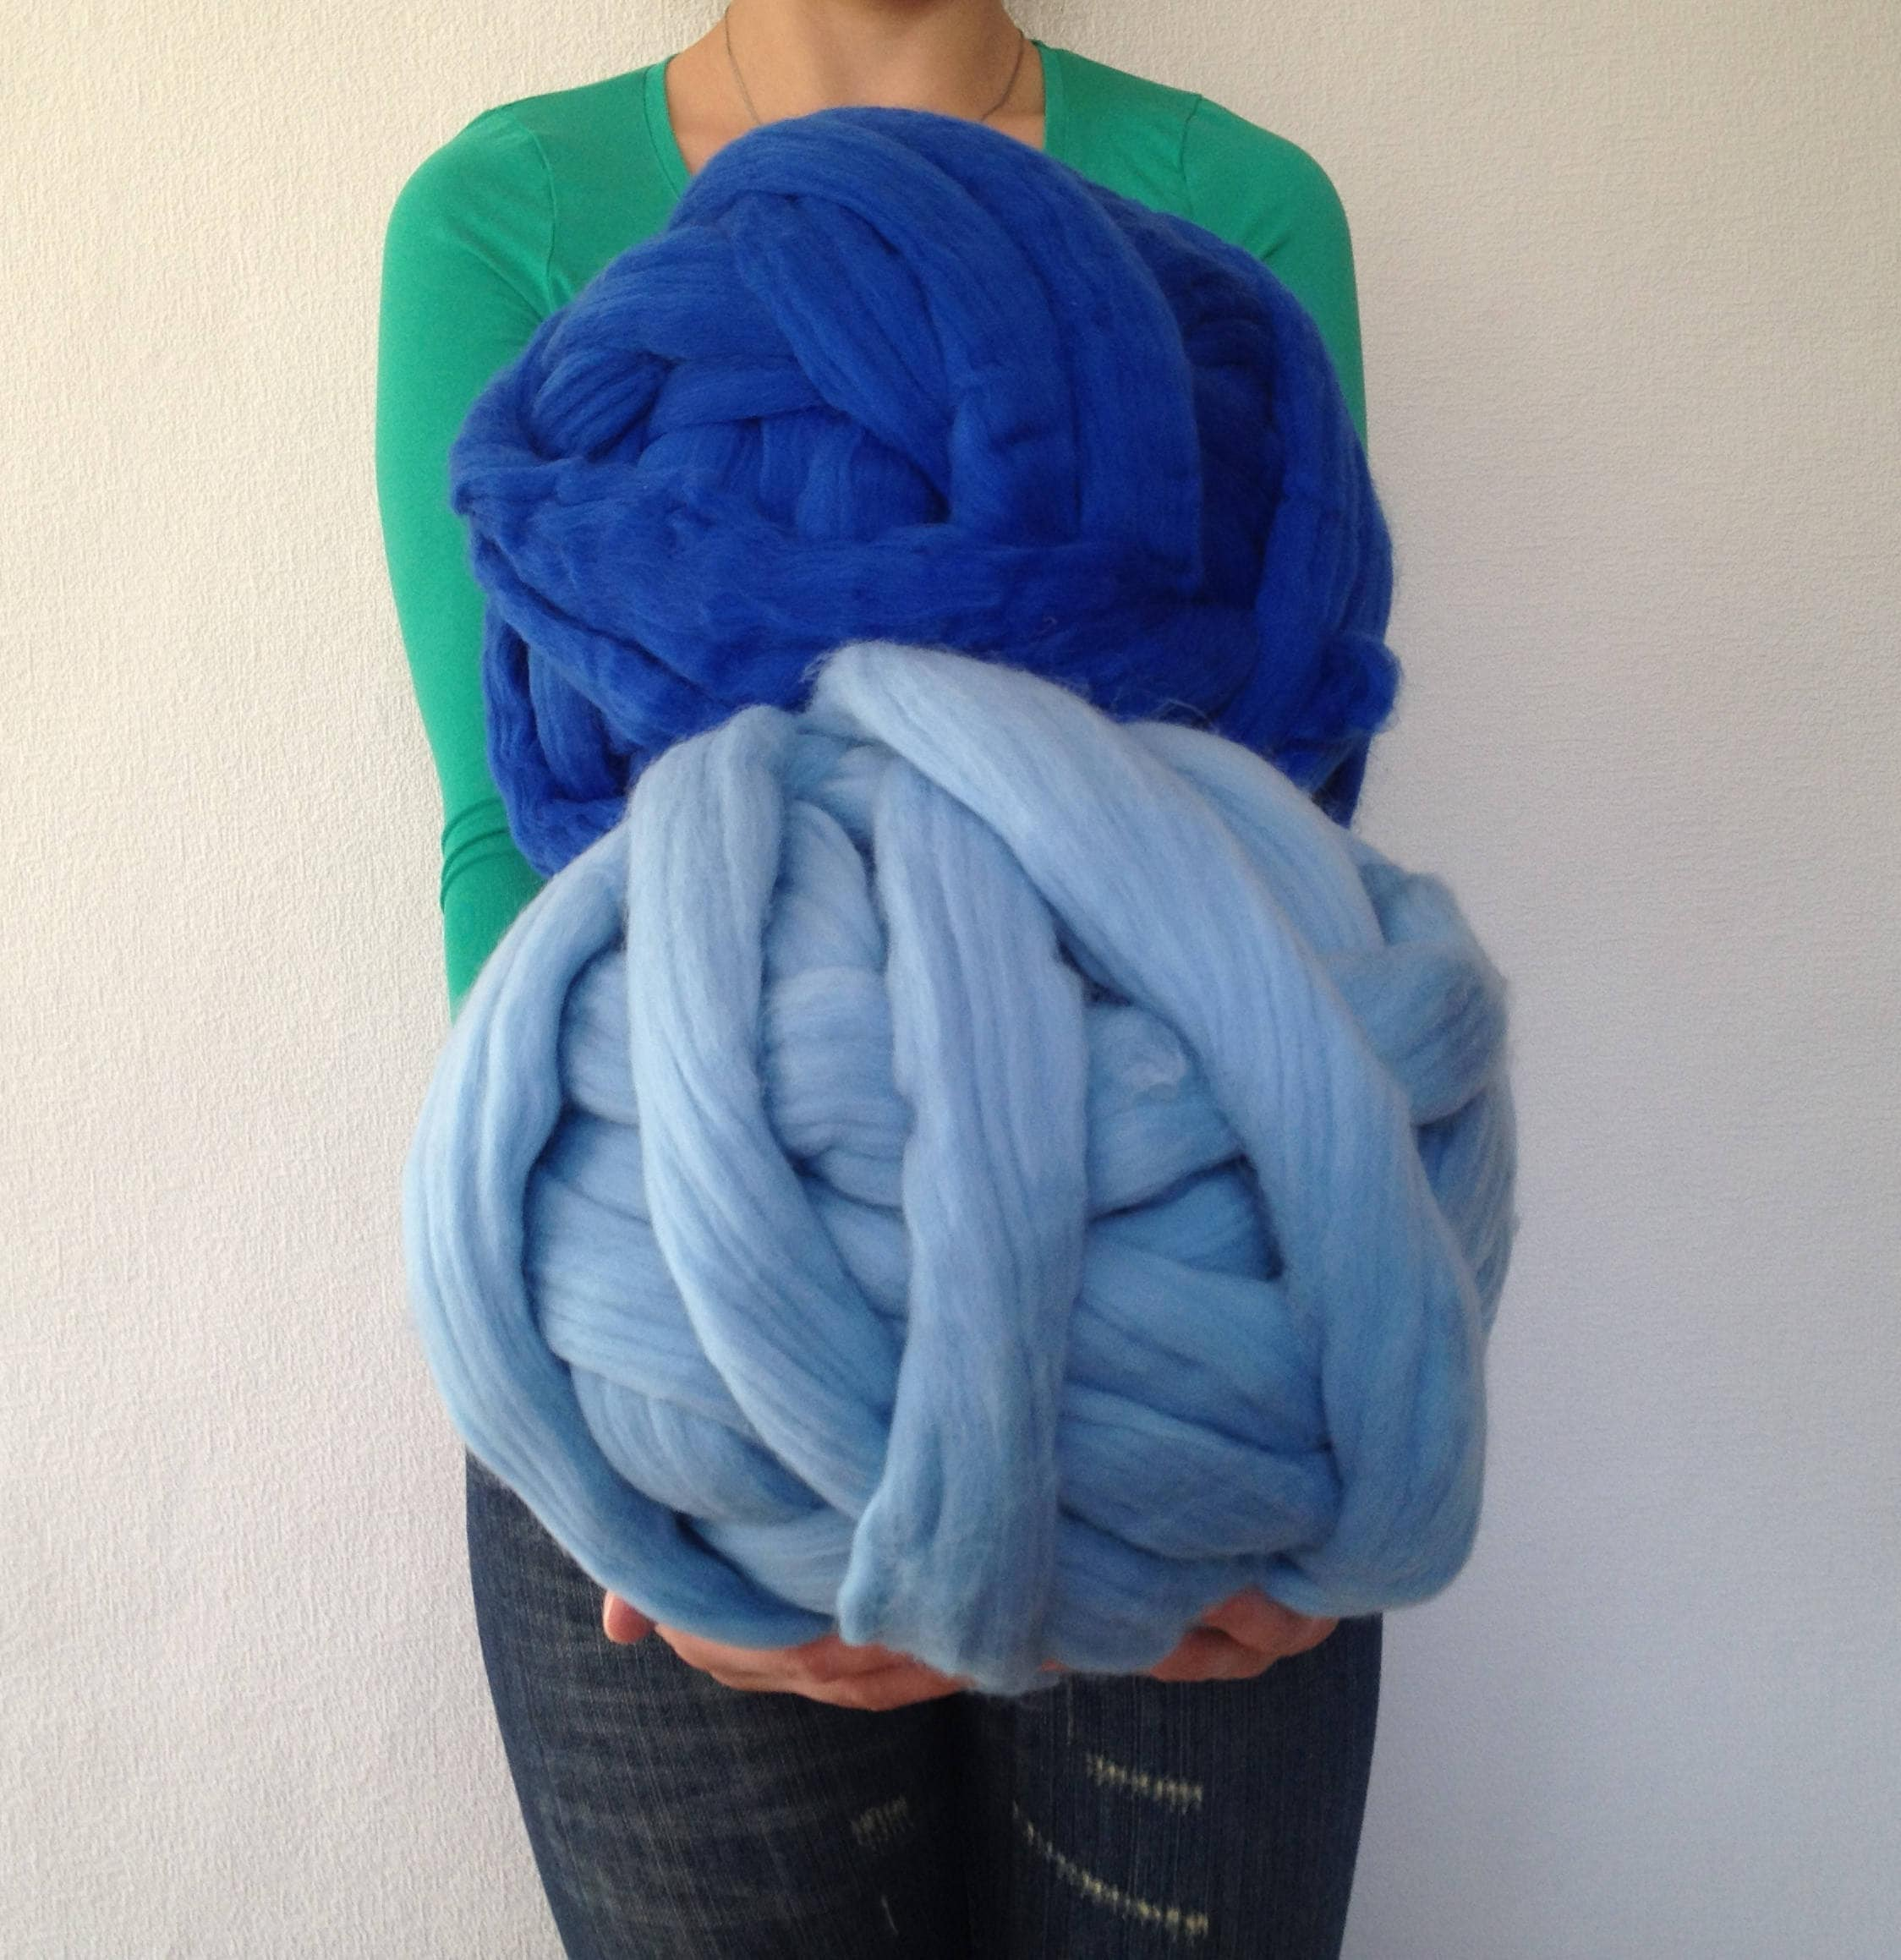 Arm Knitting Yarn Australia : Chunky wool yarn super bulky roving thick